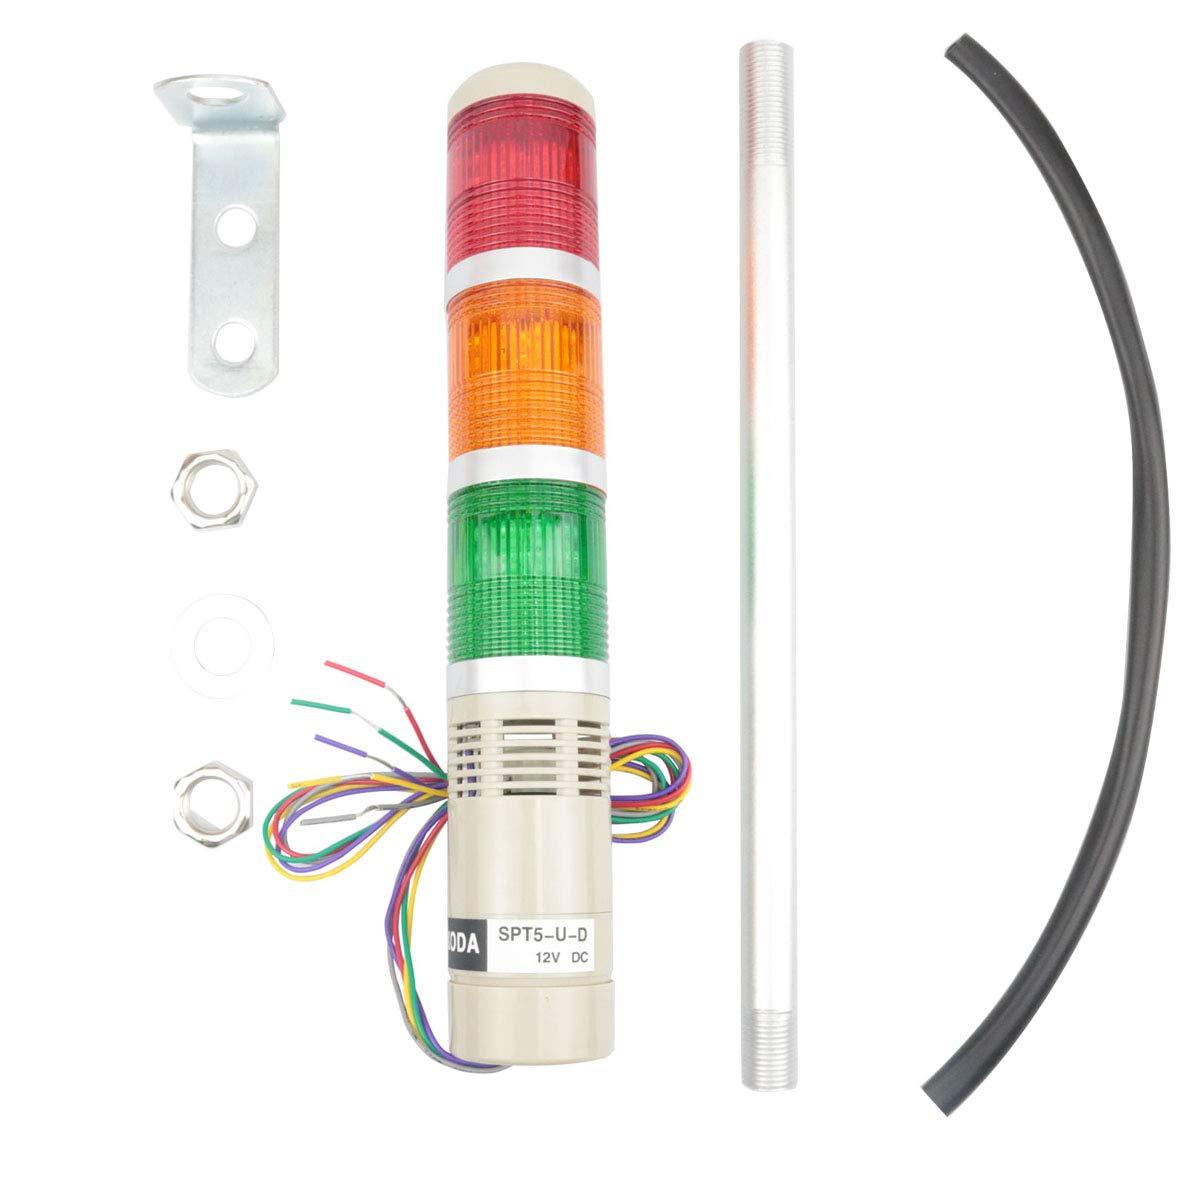 Nxtop Industrial Lamp Post LED Alarm Circular Tower Lamp Indicator Continuous Light Light Warning Lamp Buzzer Red Green Yellow DC 12V